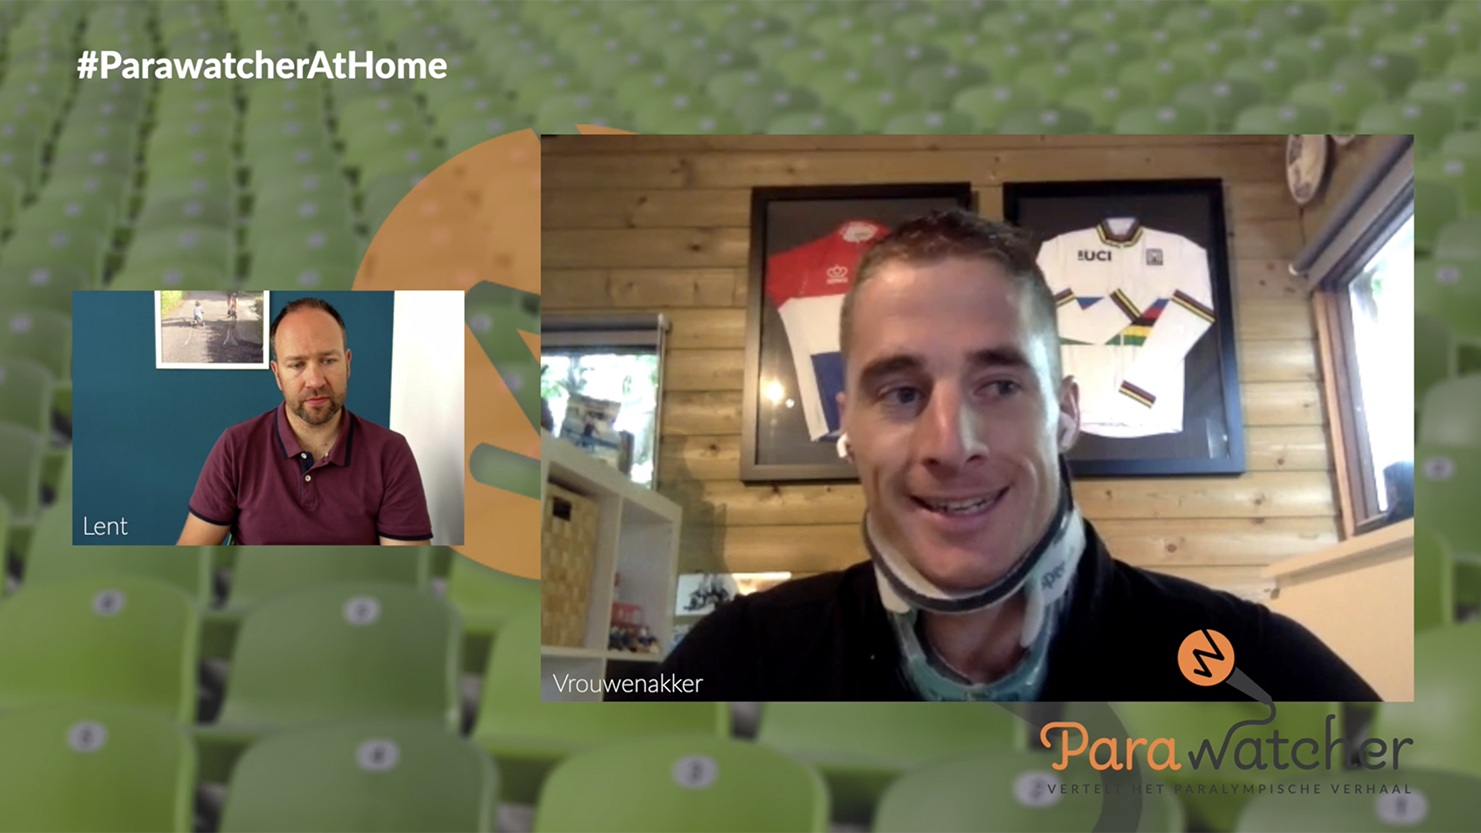 ParaWatcher At Home (8): Jetze Plat